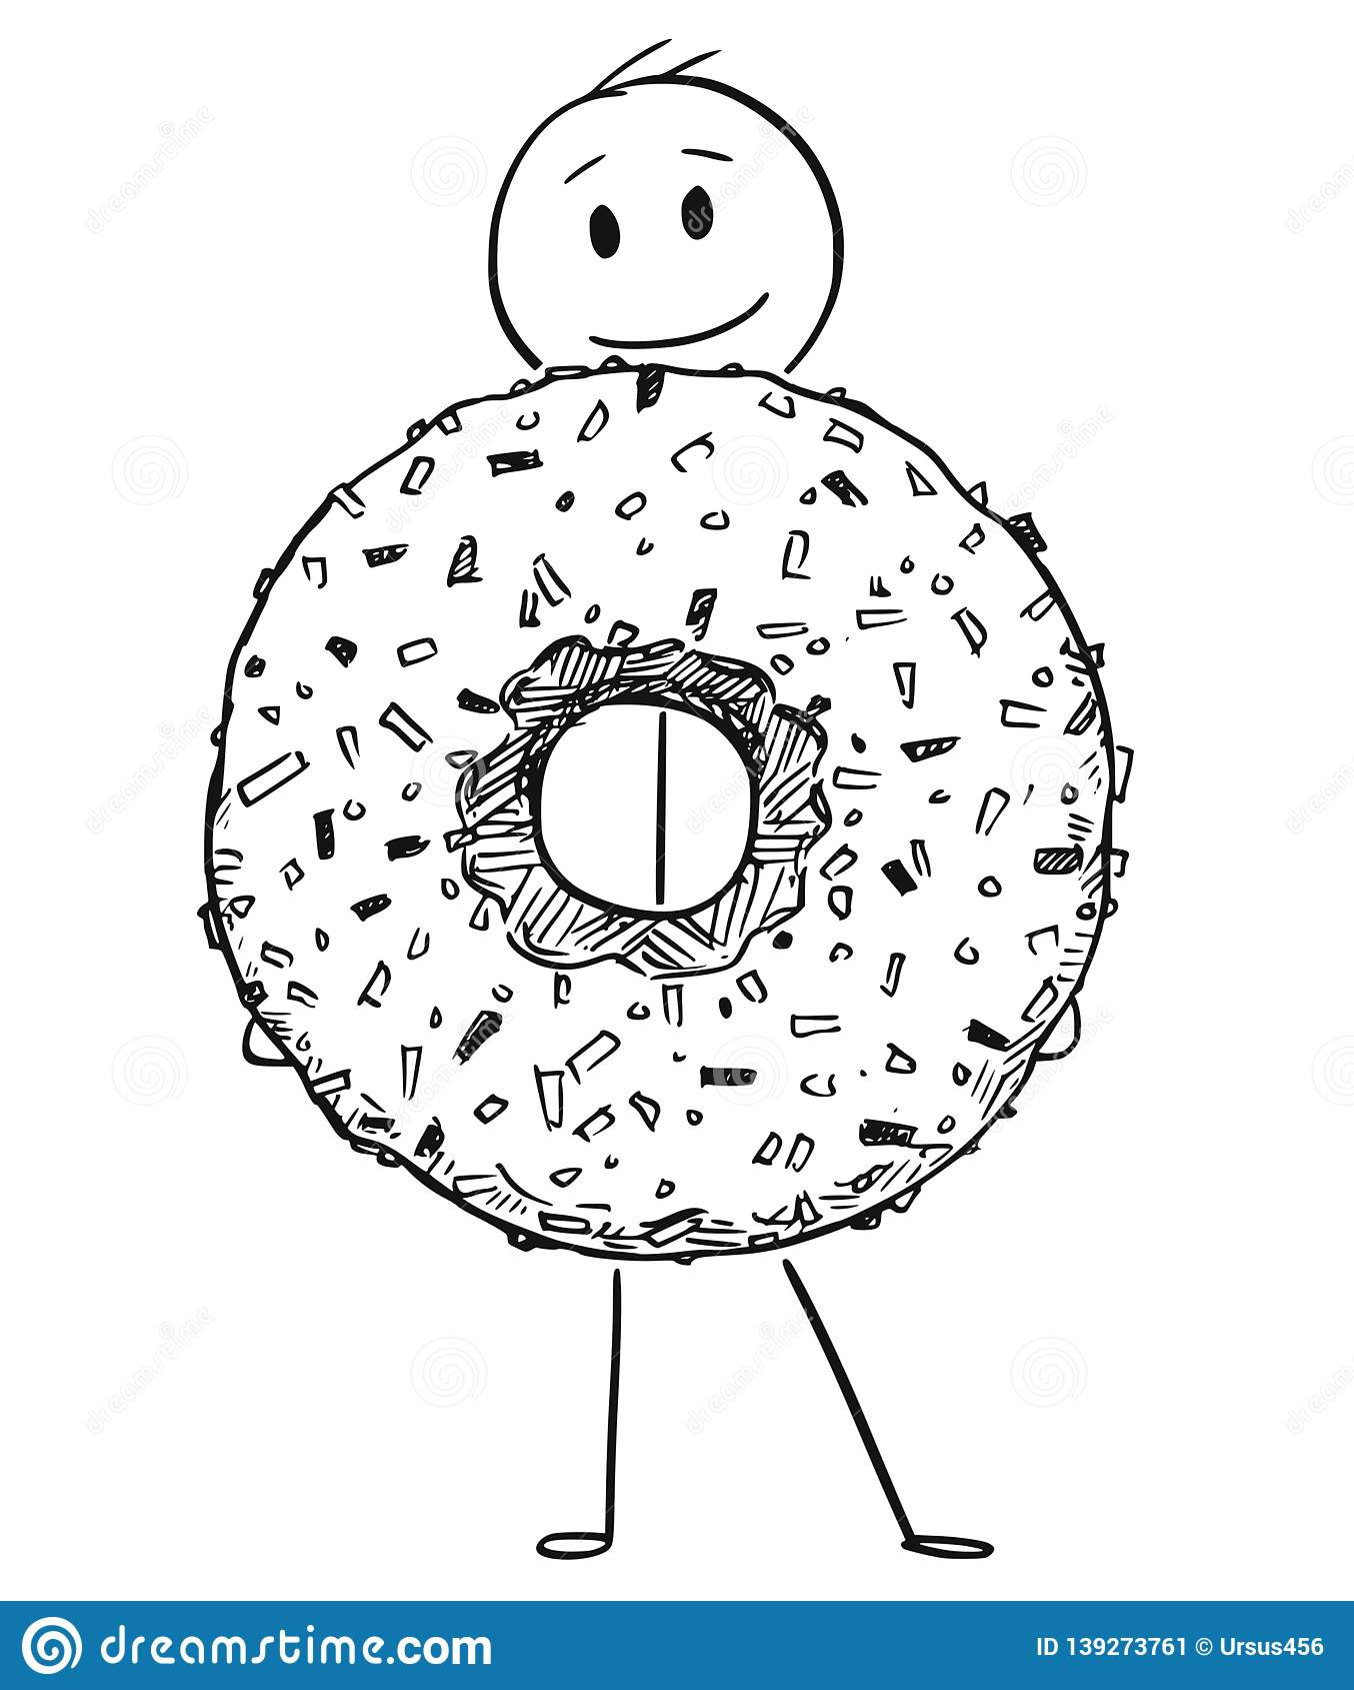 Cartoon Of Smiling Man Holding Big Donut Or Doughnut Dessert Stock